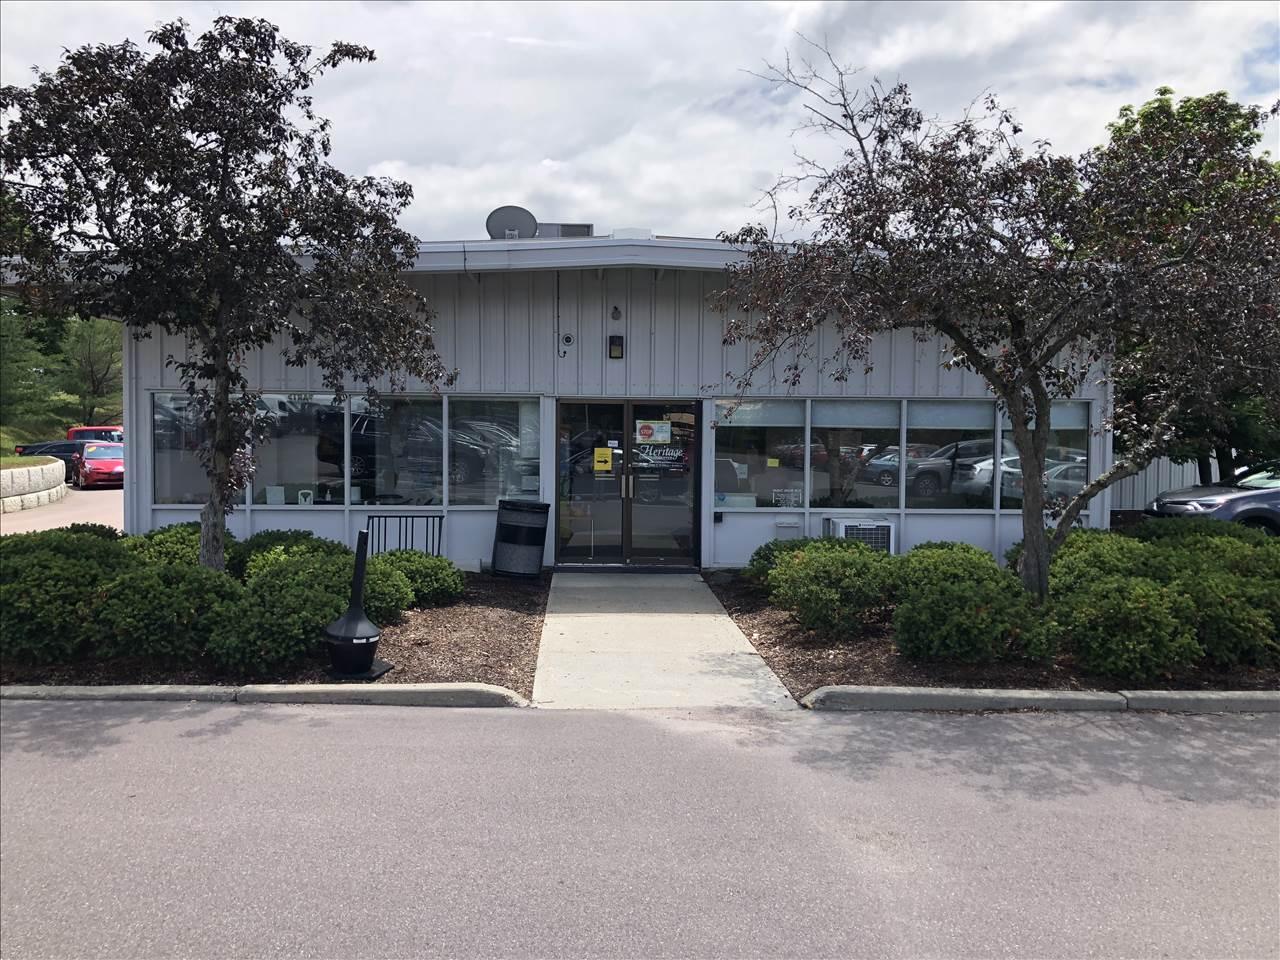 Heritage Collision Center In South Burlington Vt 05403 Auto Body Shops Carwise Com